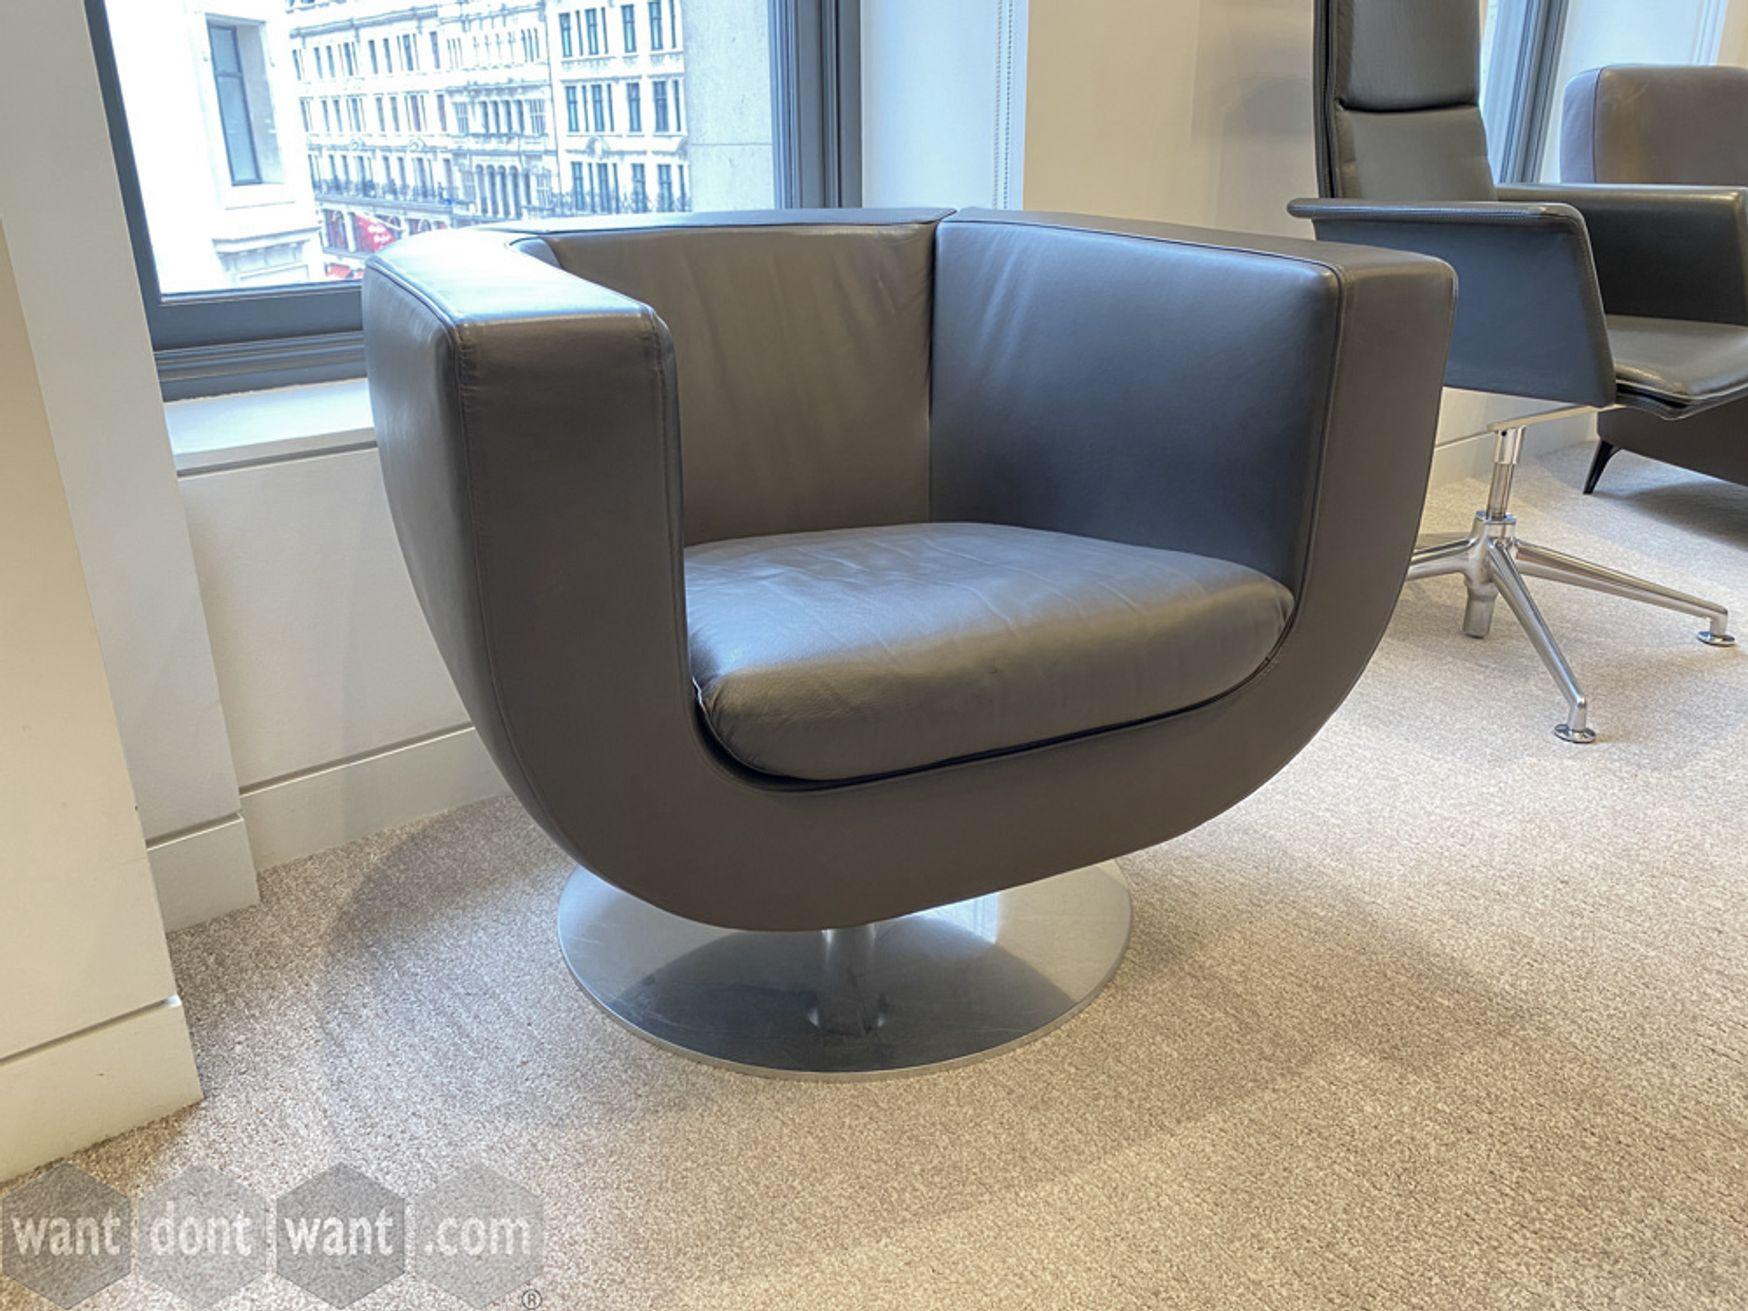 Used B&B Italia 'Tulip' swivel chair